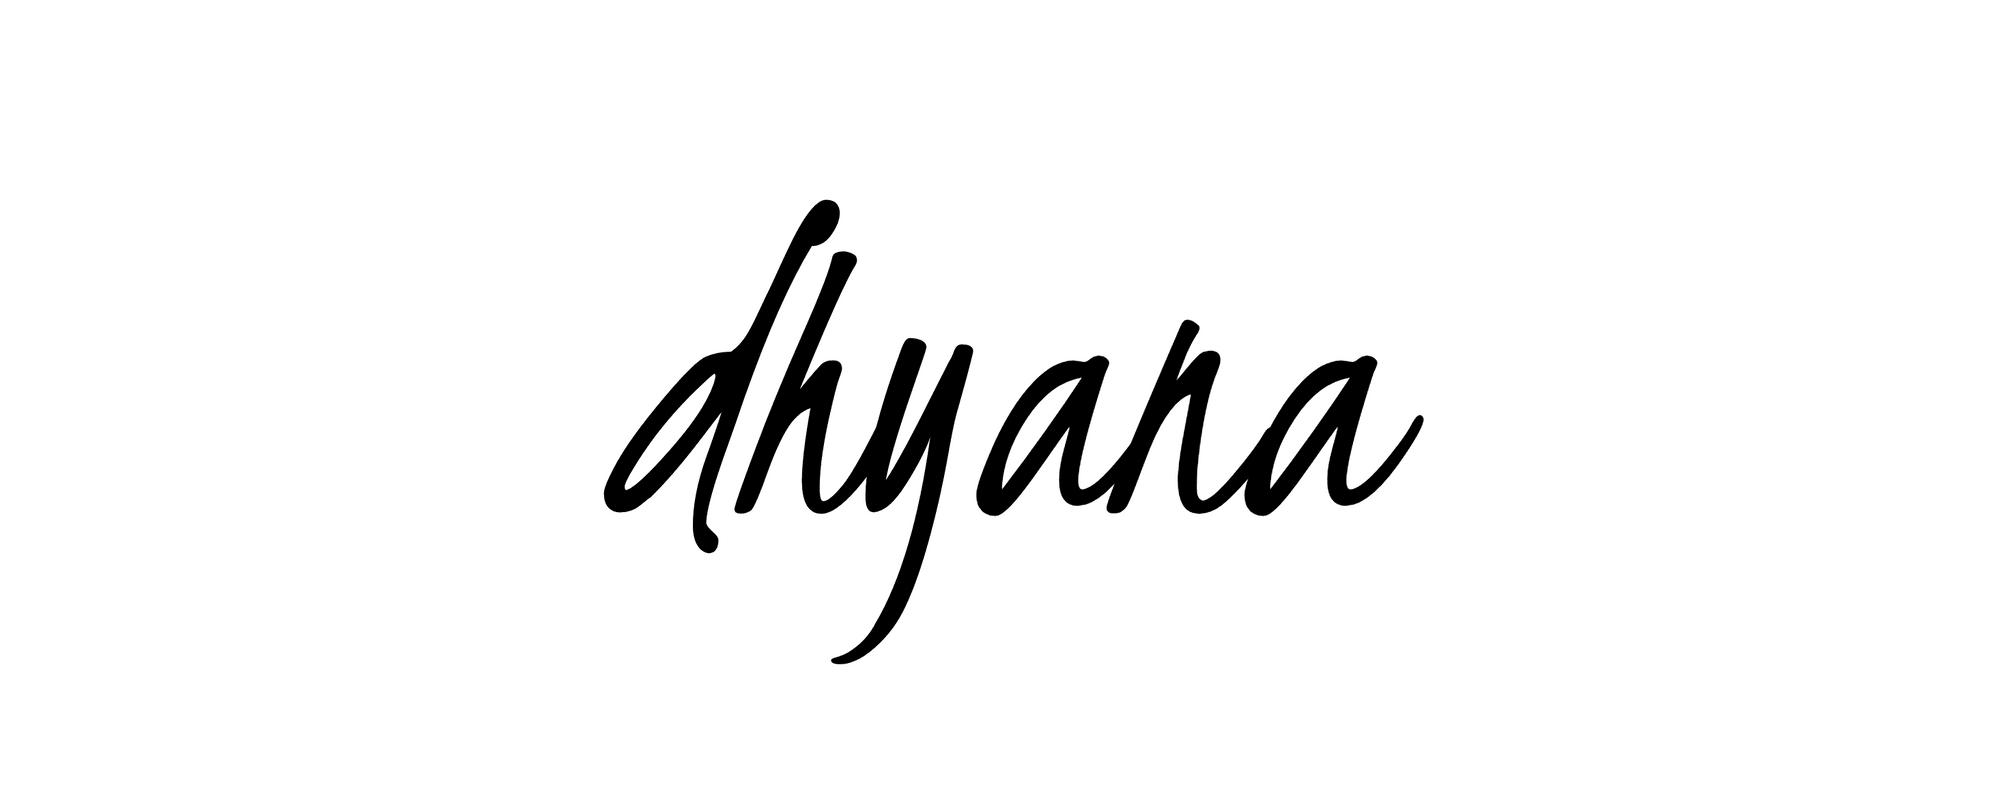 Yogaens otte trin - Dhyana